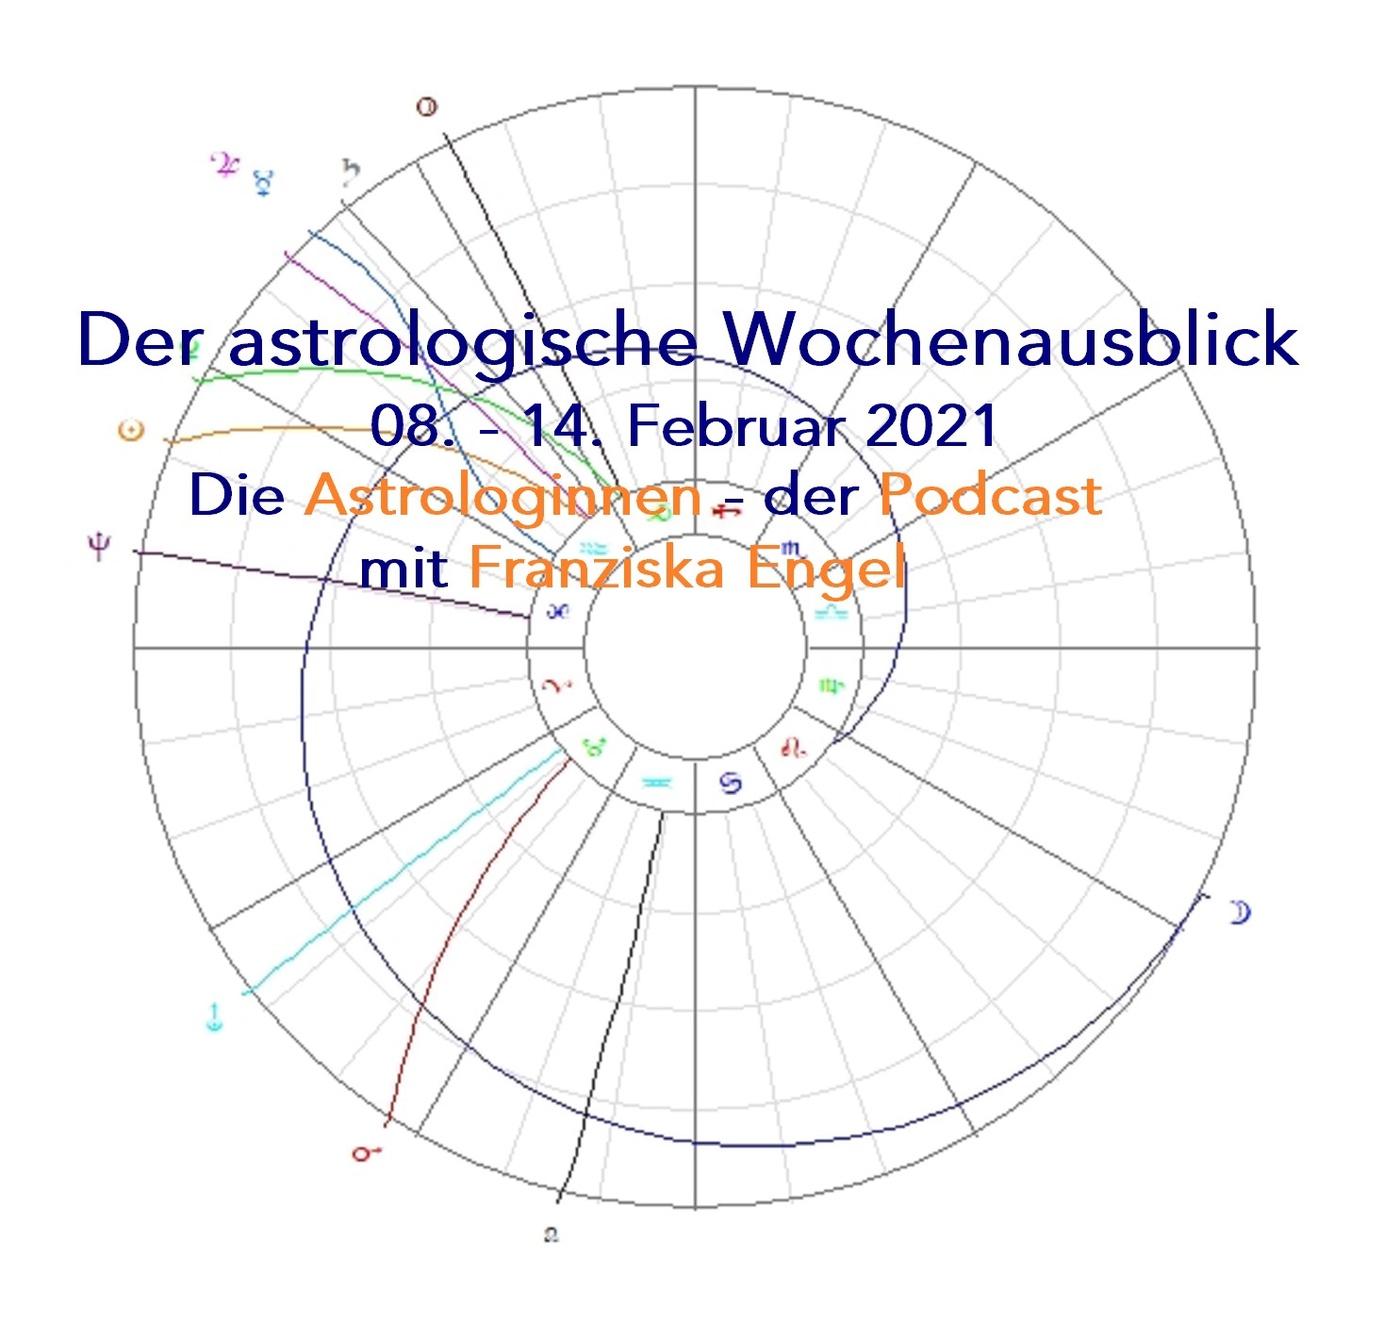 Astrologischer Wochenausblick 08. - 14. Februar 2021